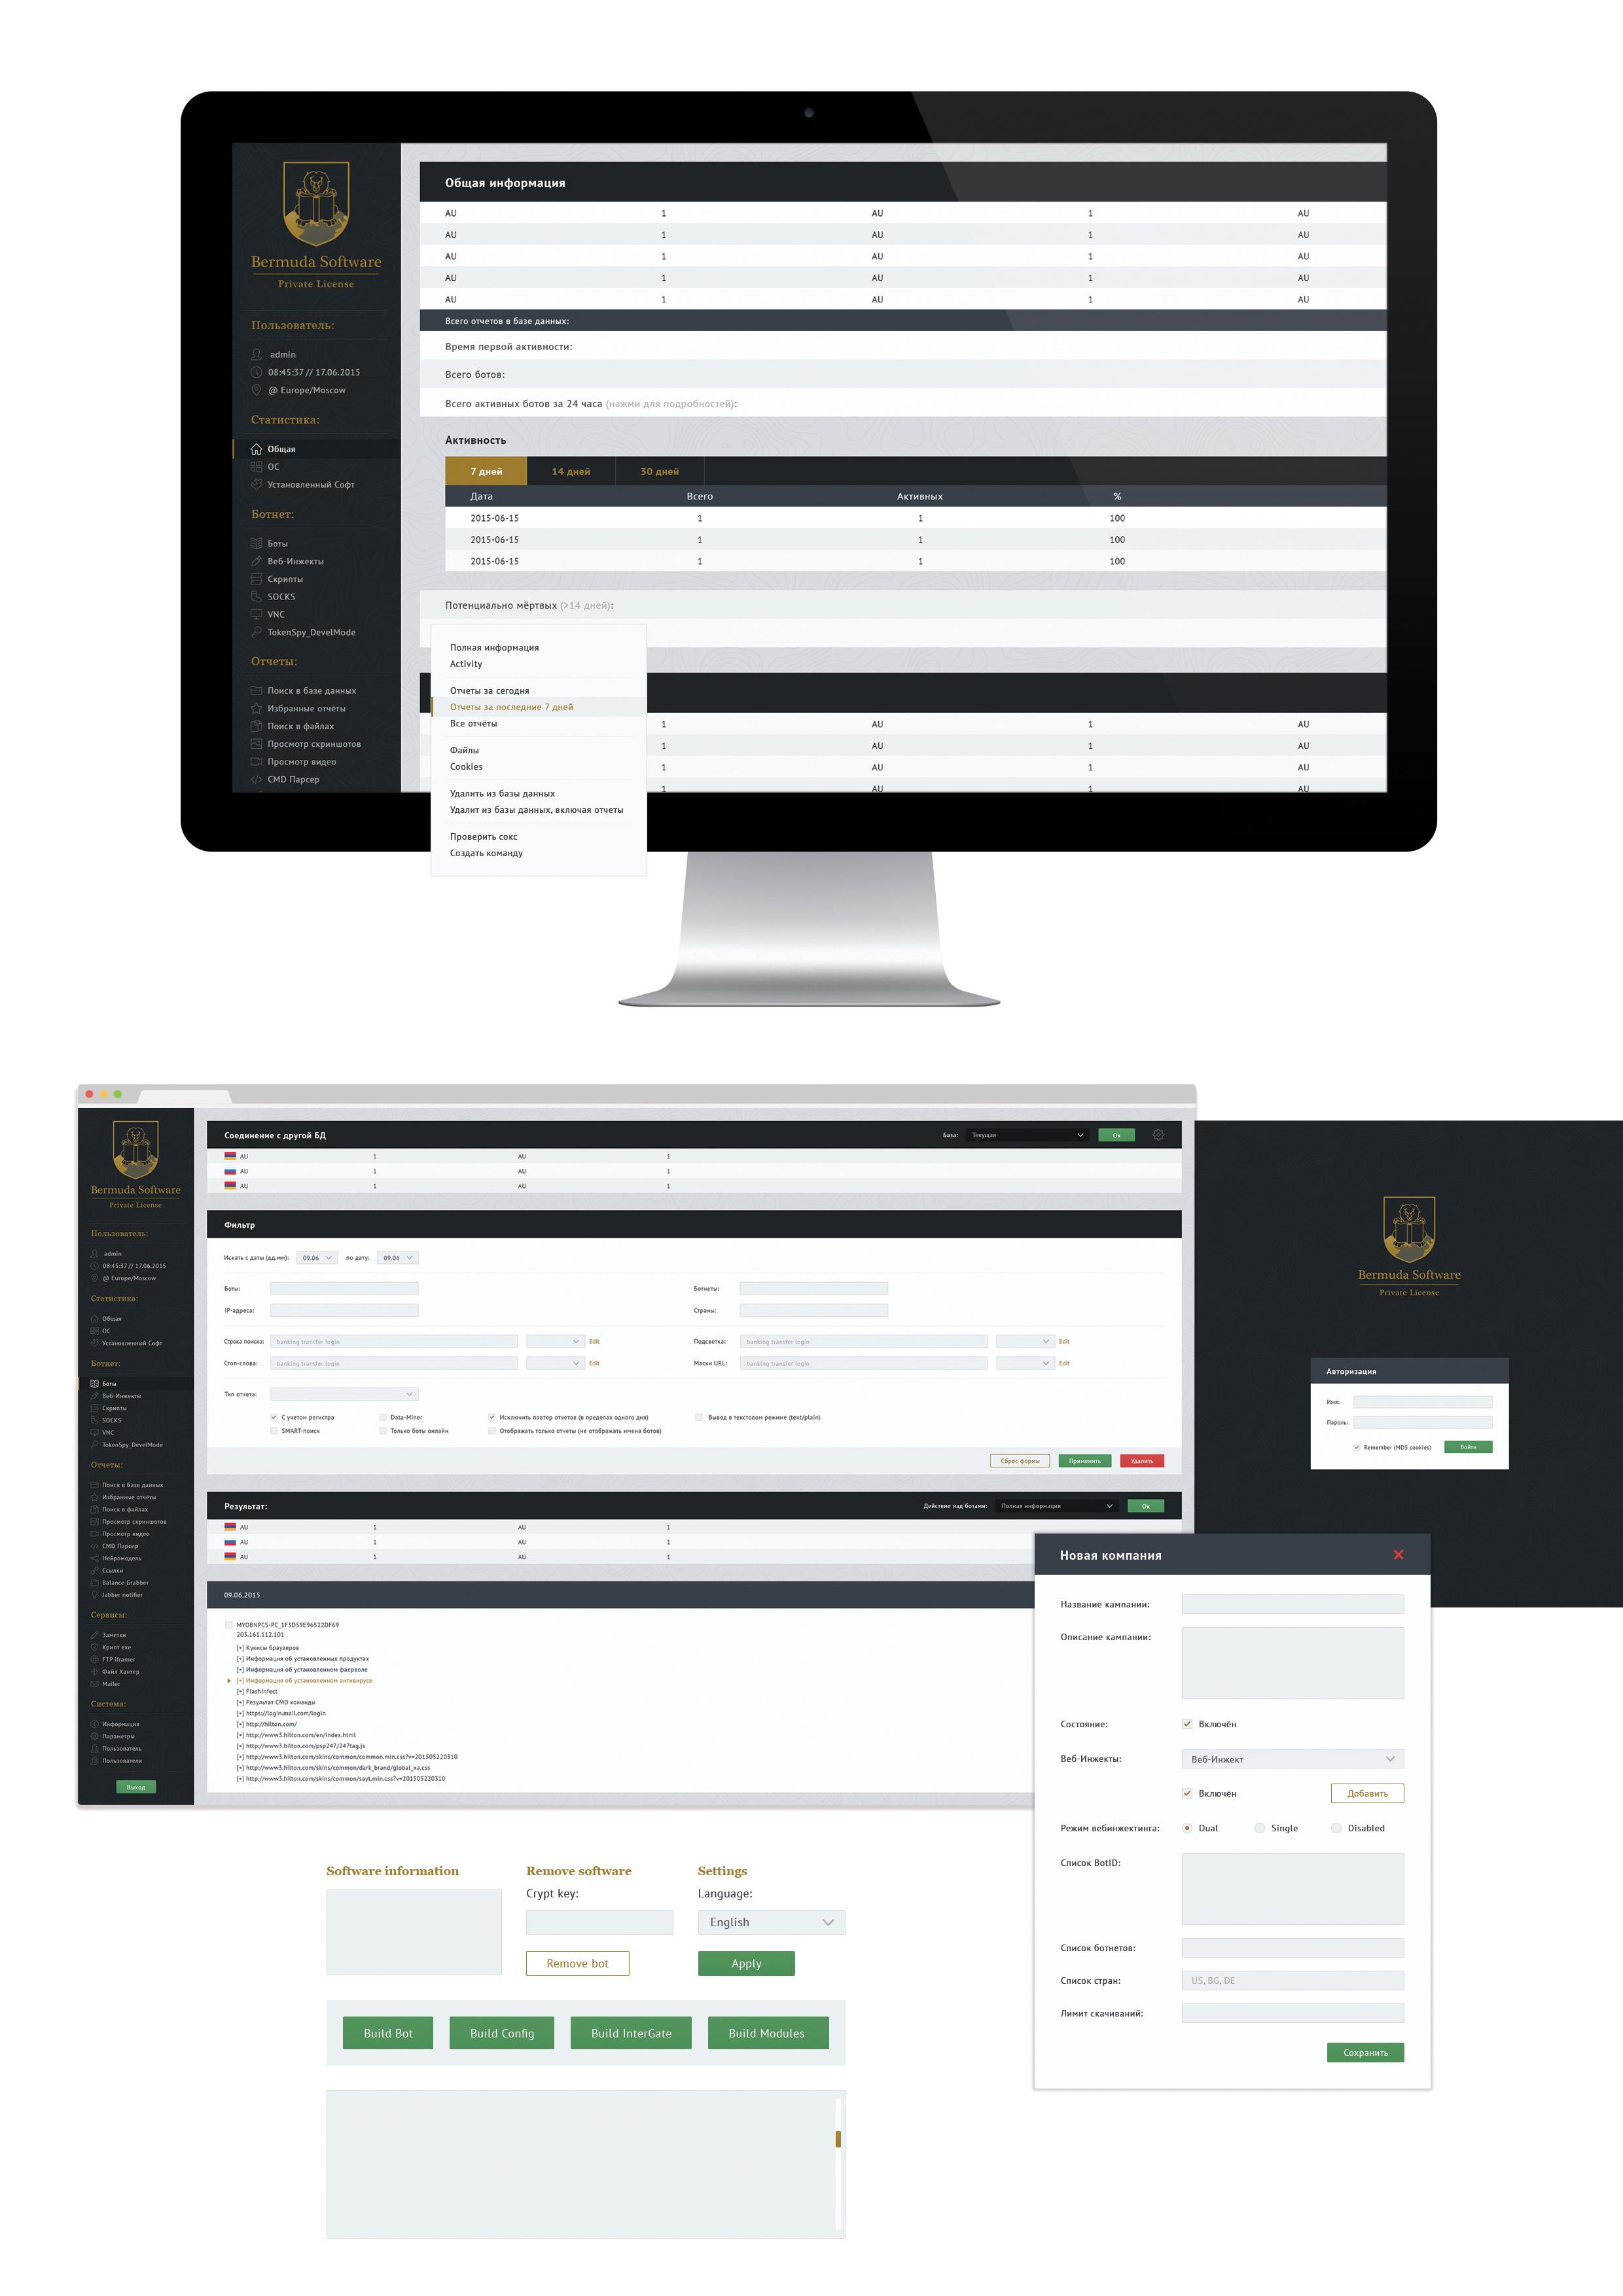 Дизайн интерфейса Бермуда